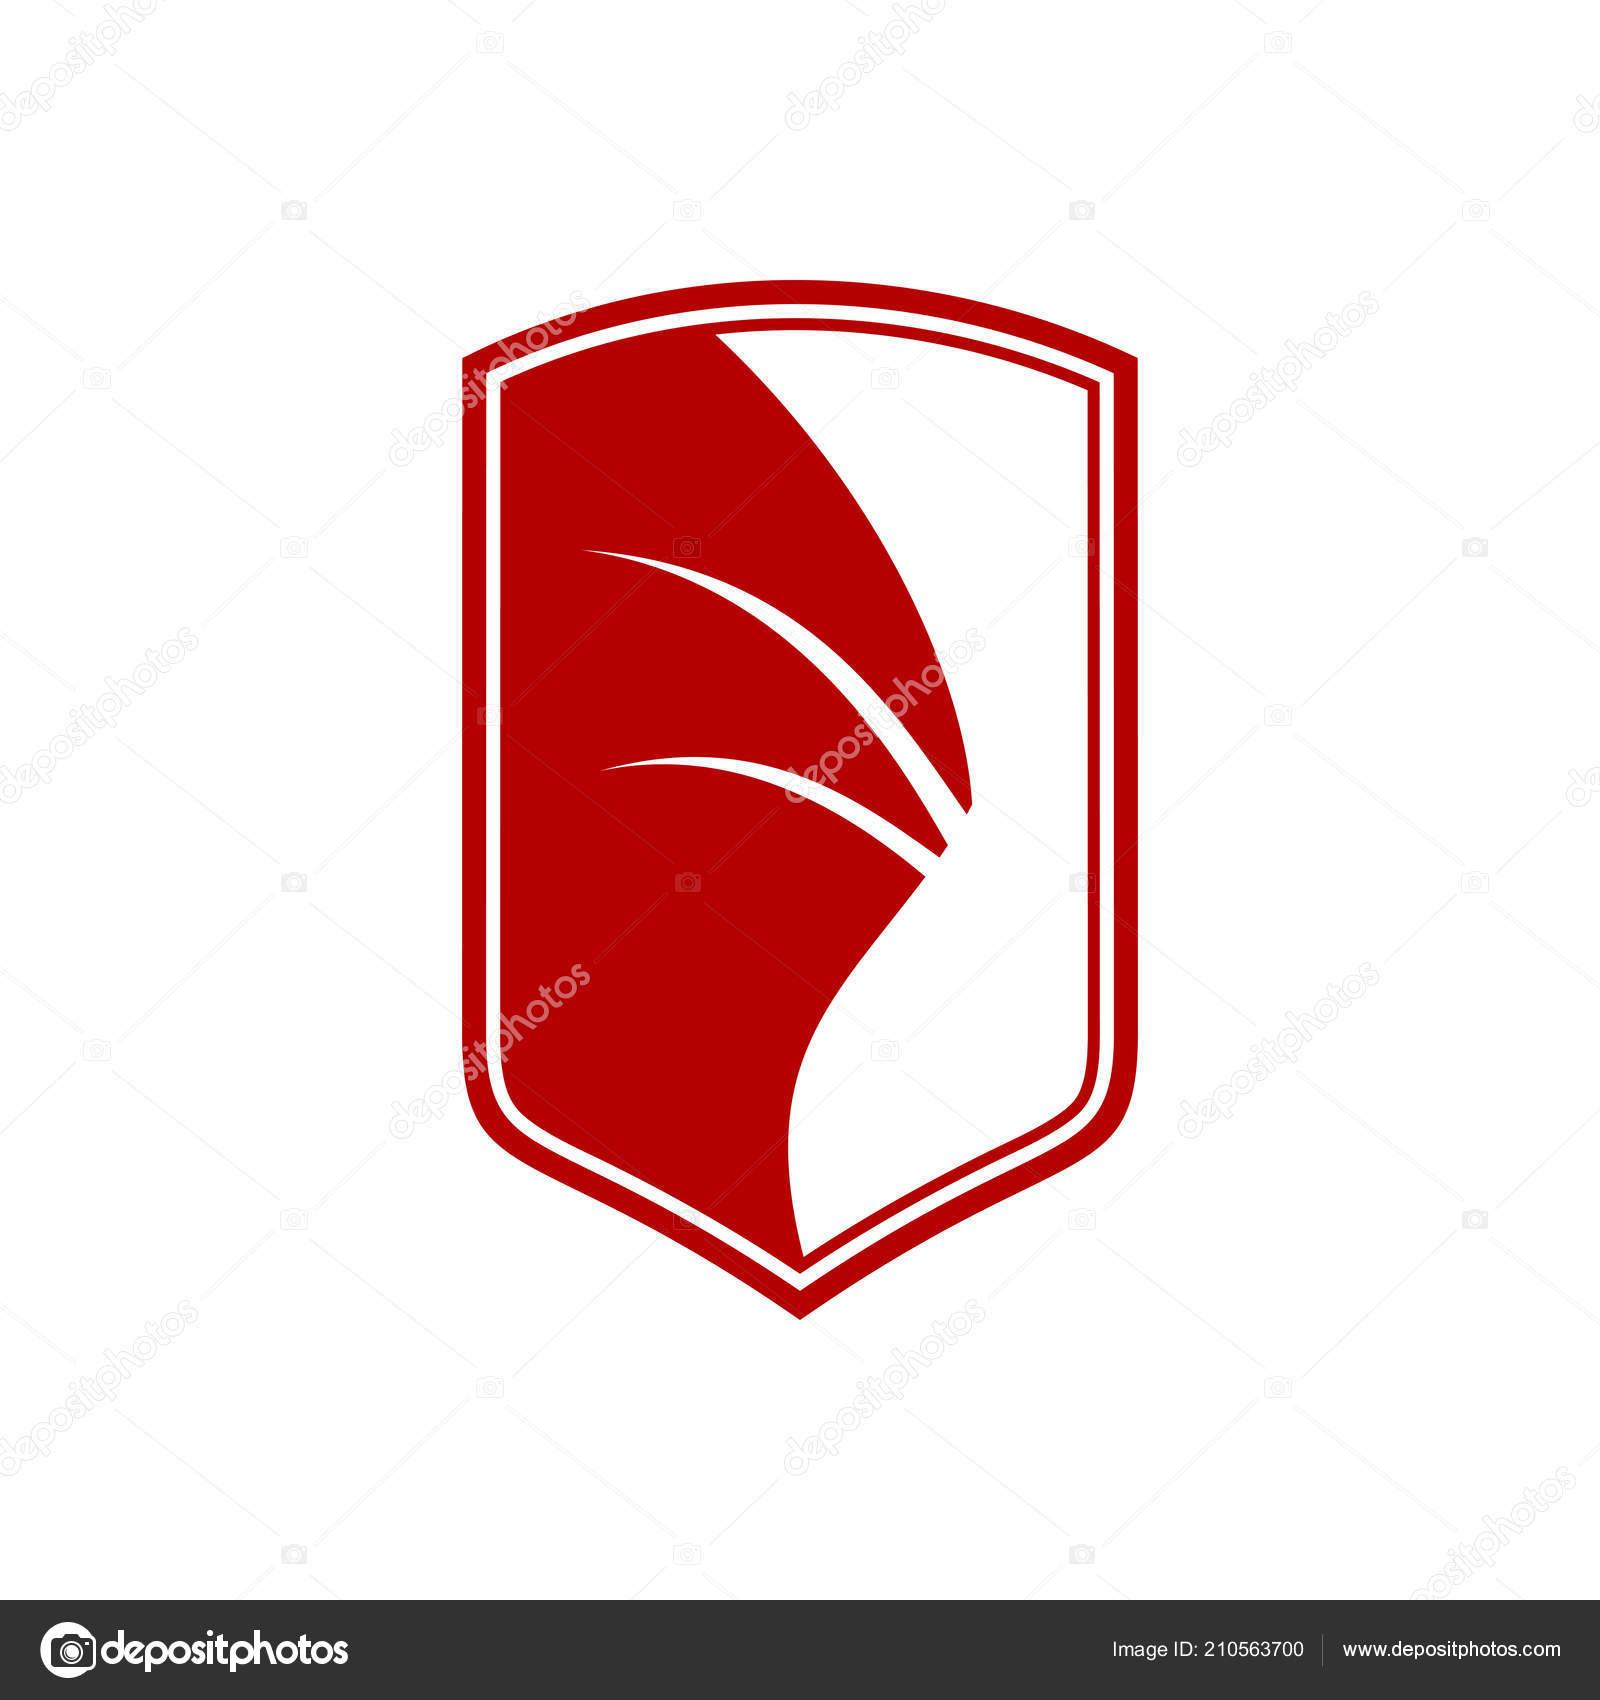 Dragon Wing Shield Sigil Vector Symbol Graphic Logo Design Template Stock